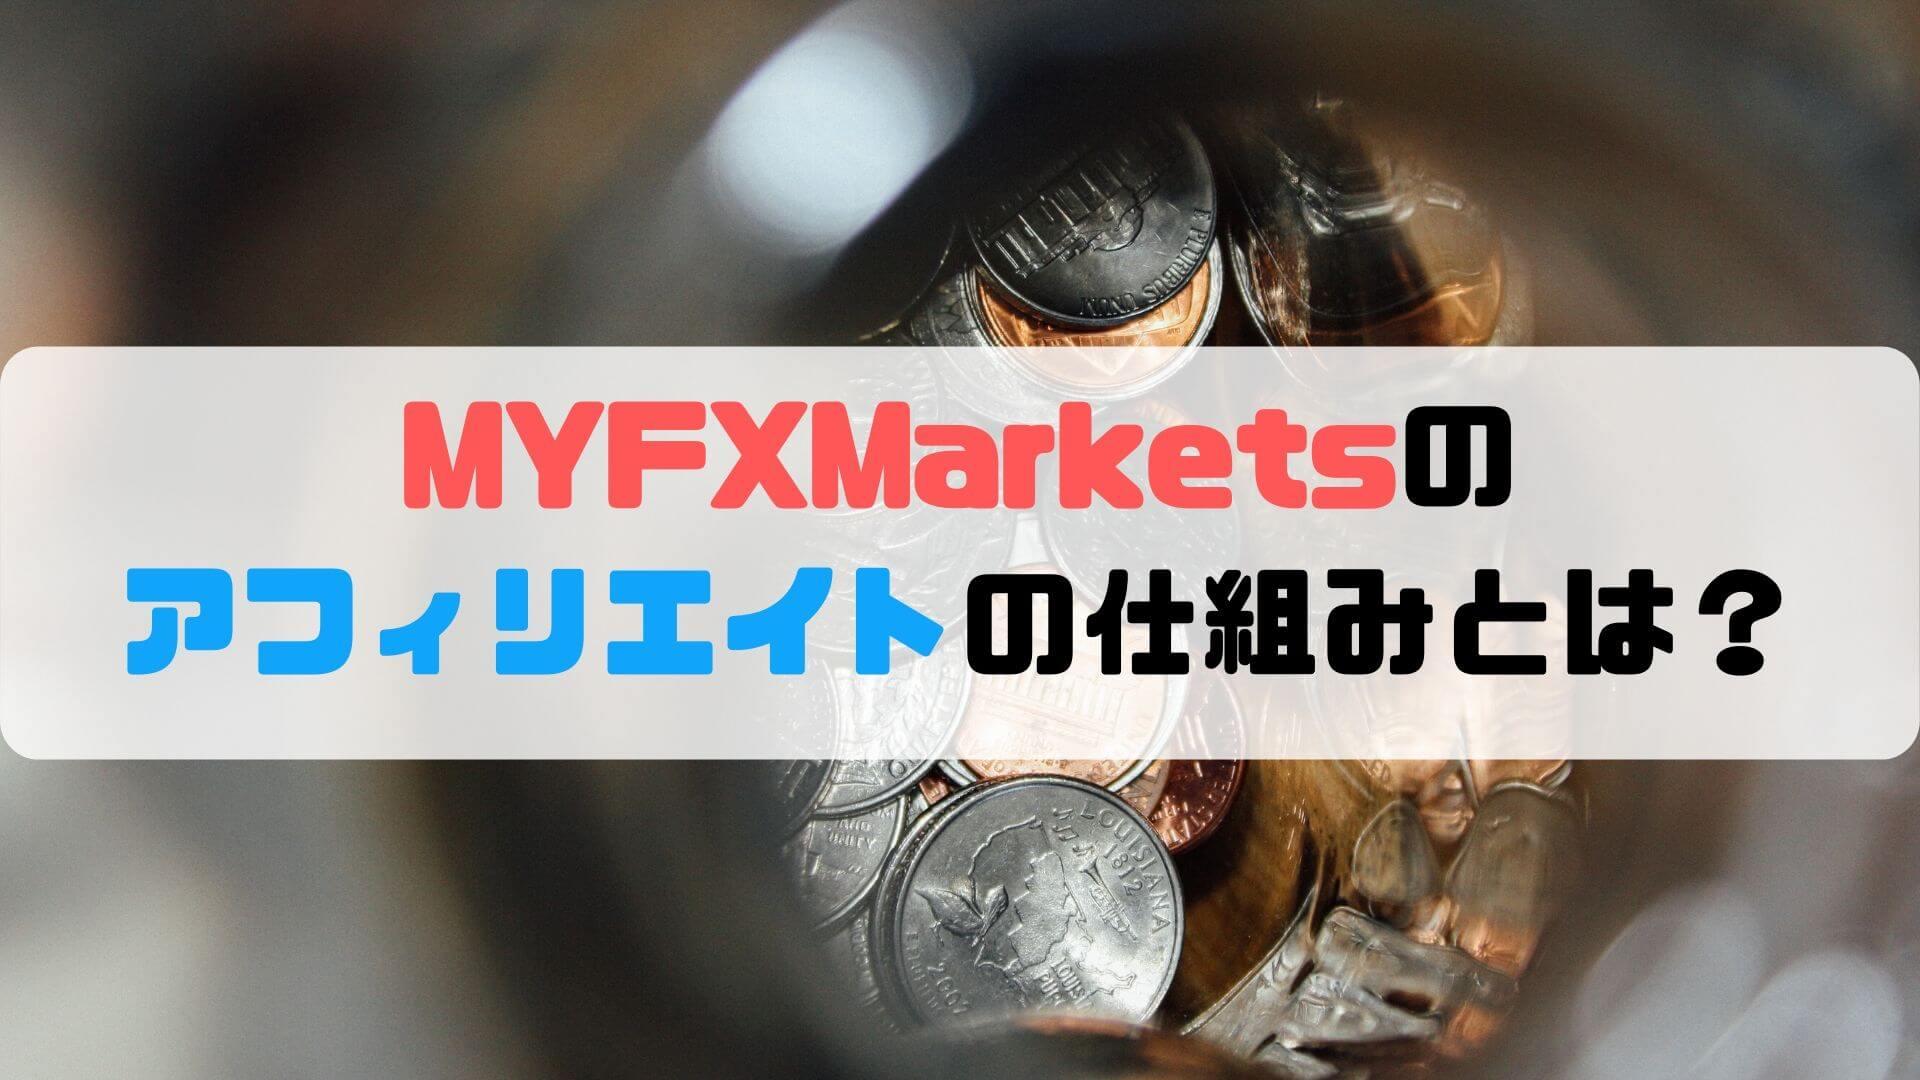 MYFXMarkets アフィリエイト